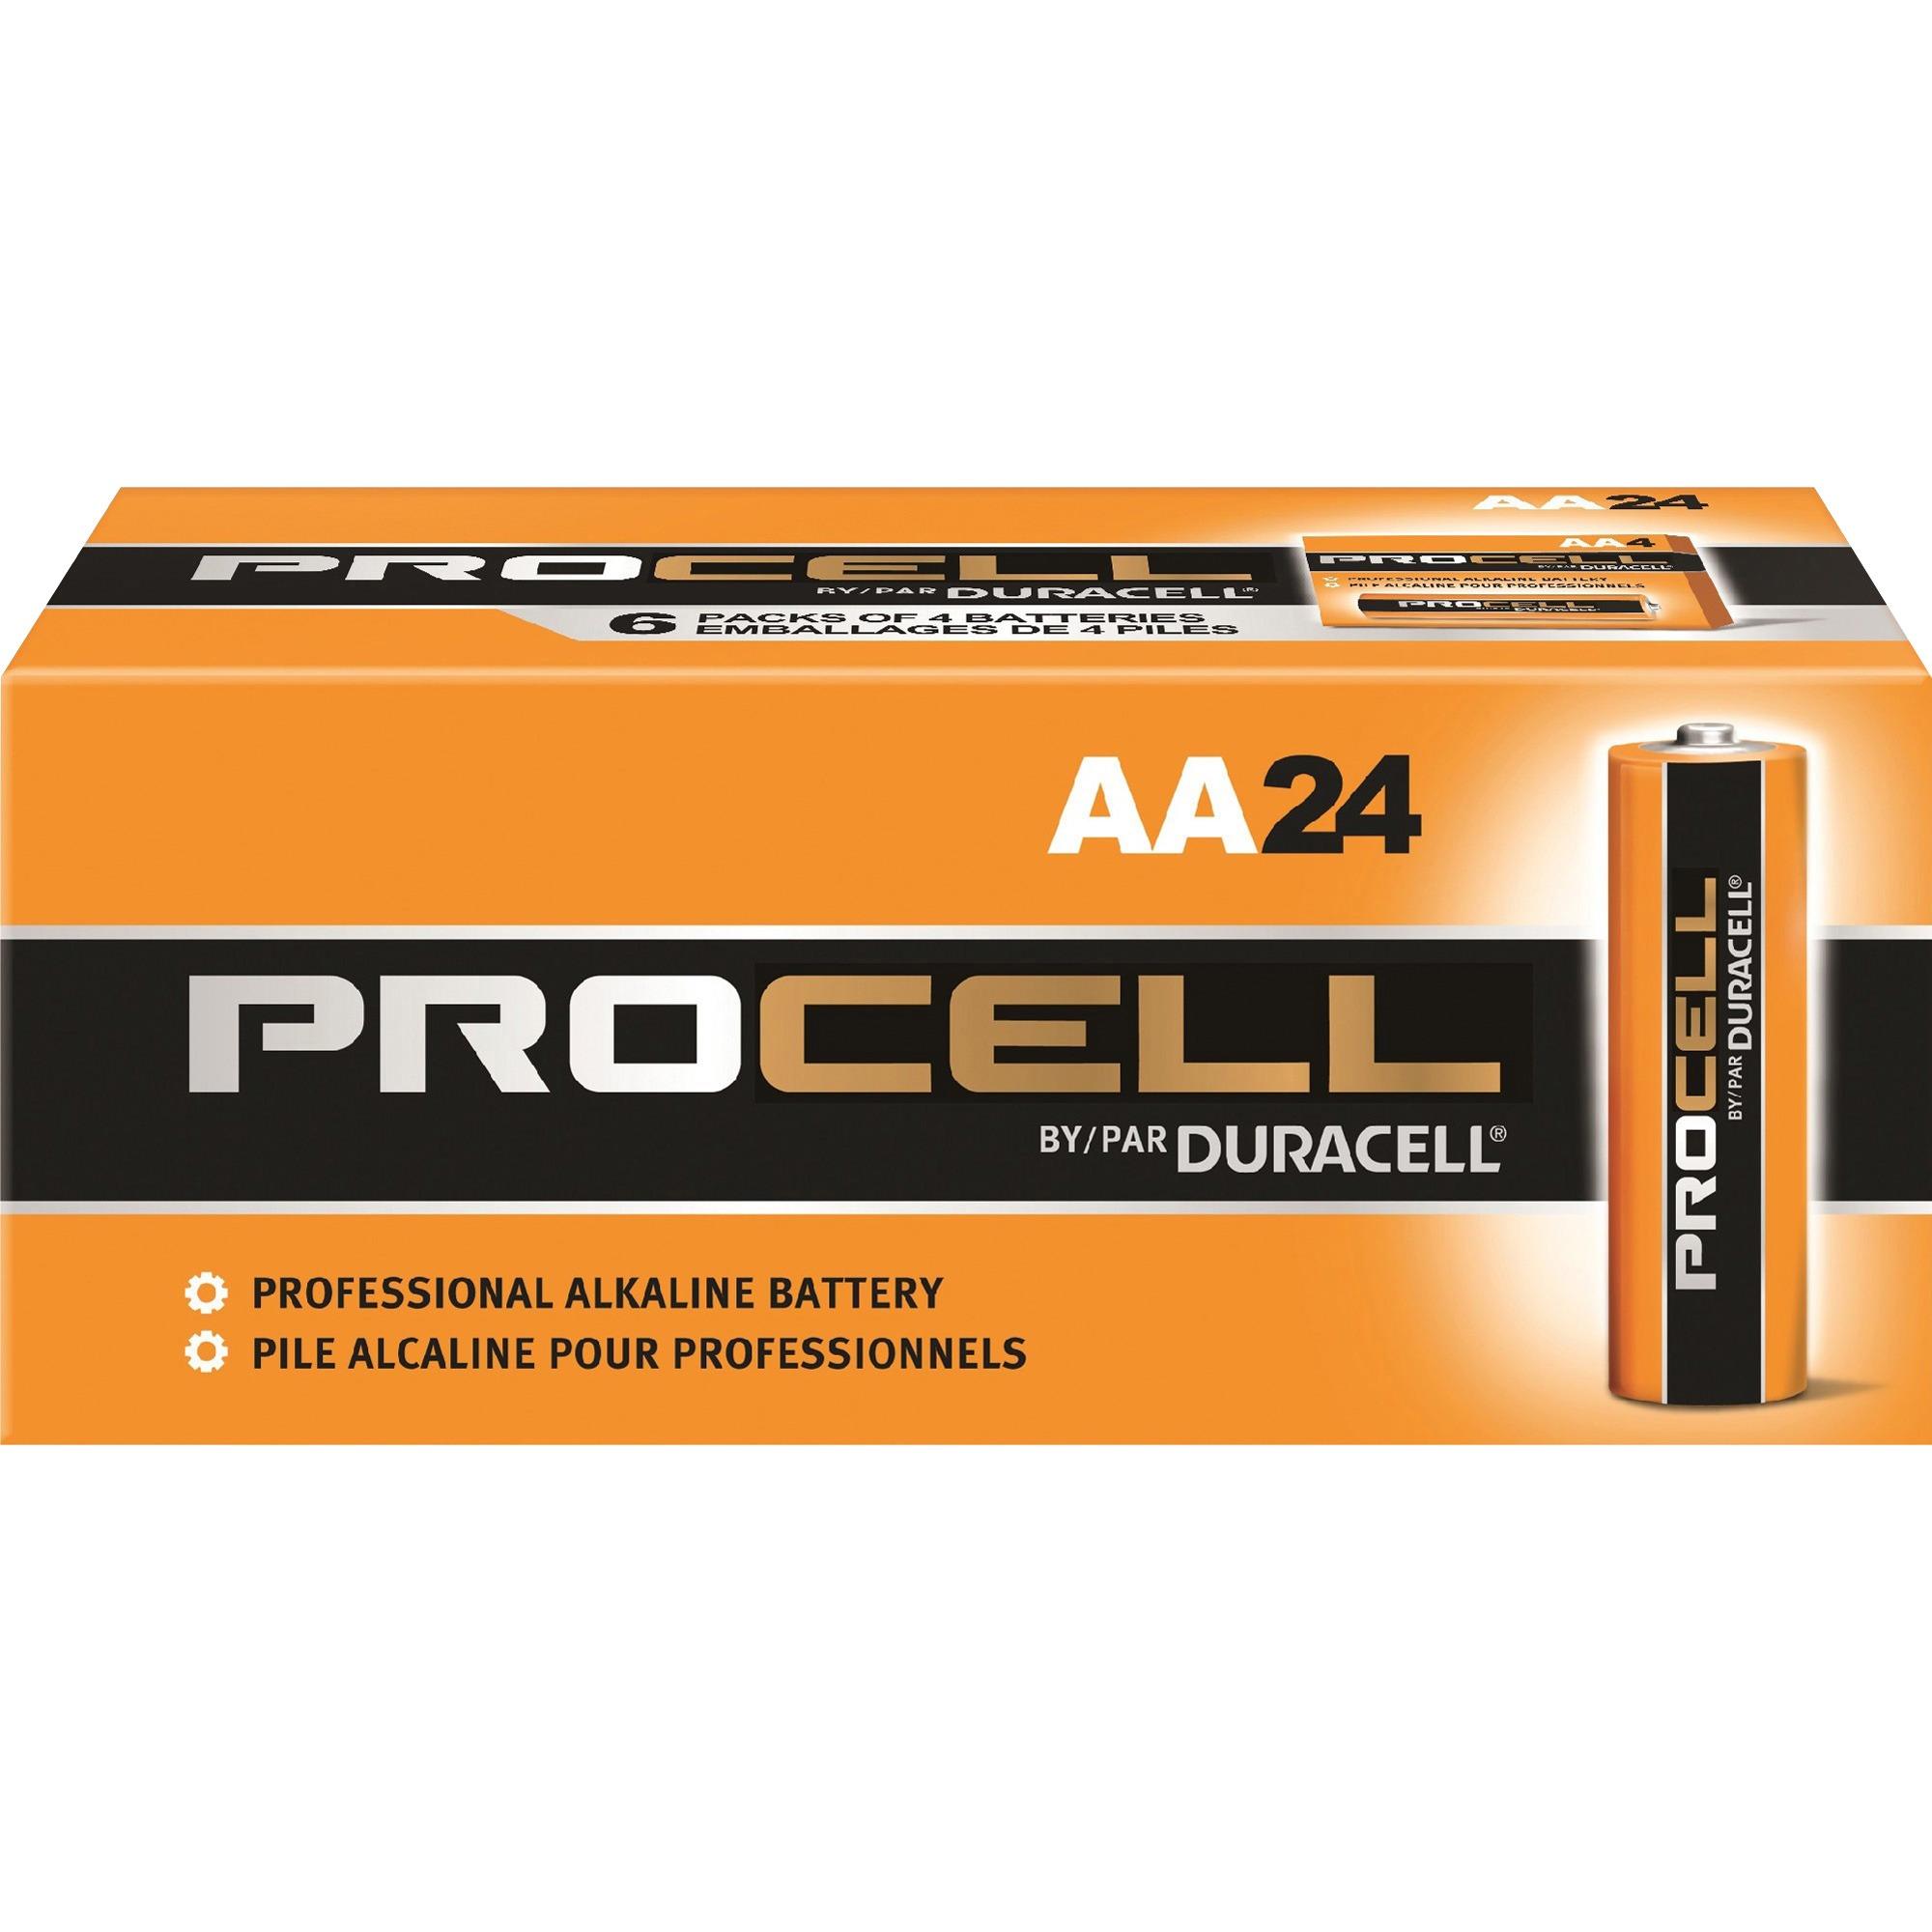 Duracell Procell Alkaline AA Battery - PC1500